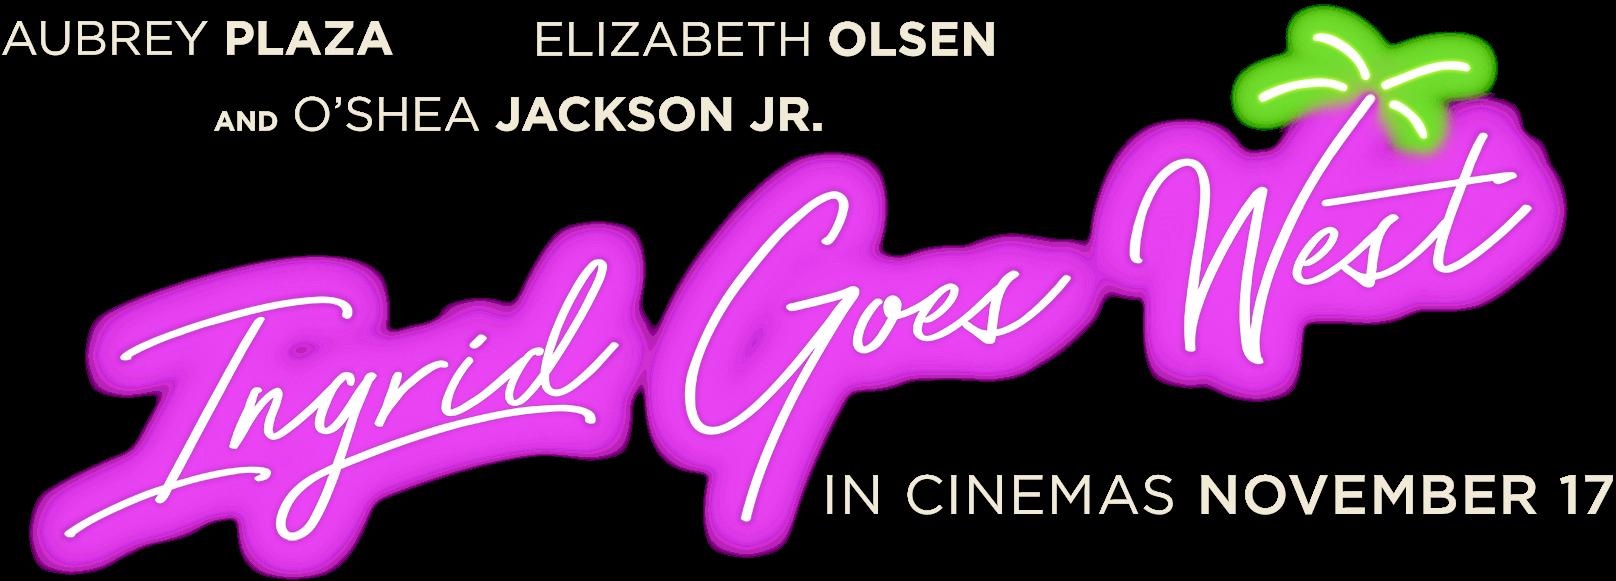 Ingrid Goes West 2017 Logo Png (1667x605), Png Download